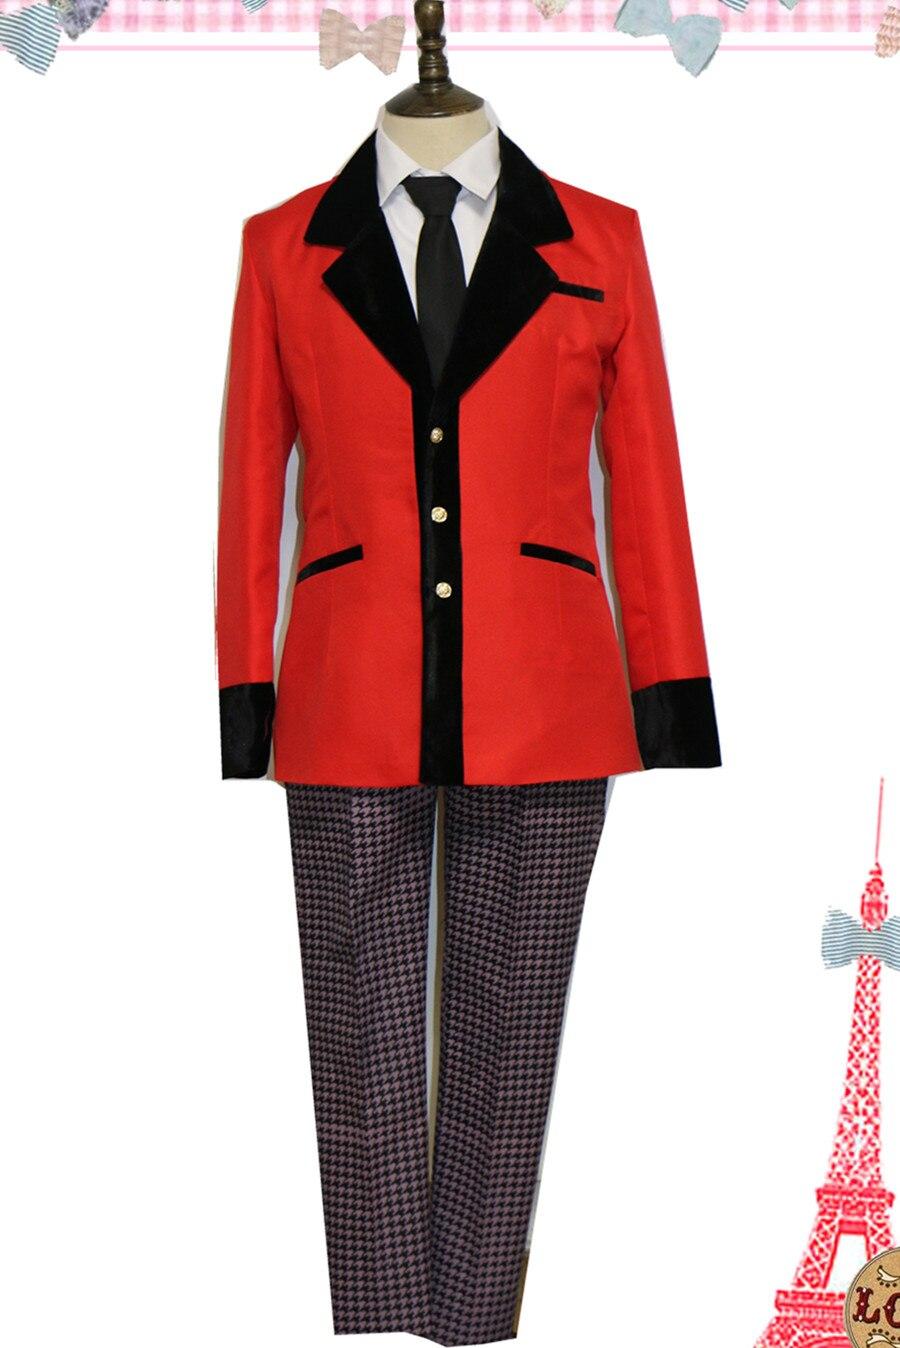 Kakegurui Ryota Suzui Kaede Manyuda negro uniforme rojo Cosplay traje X006